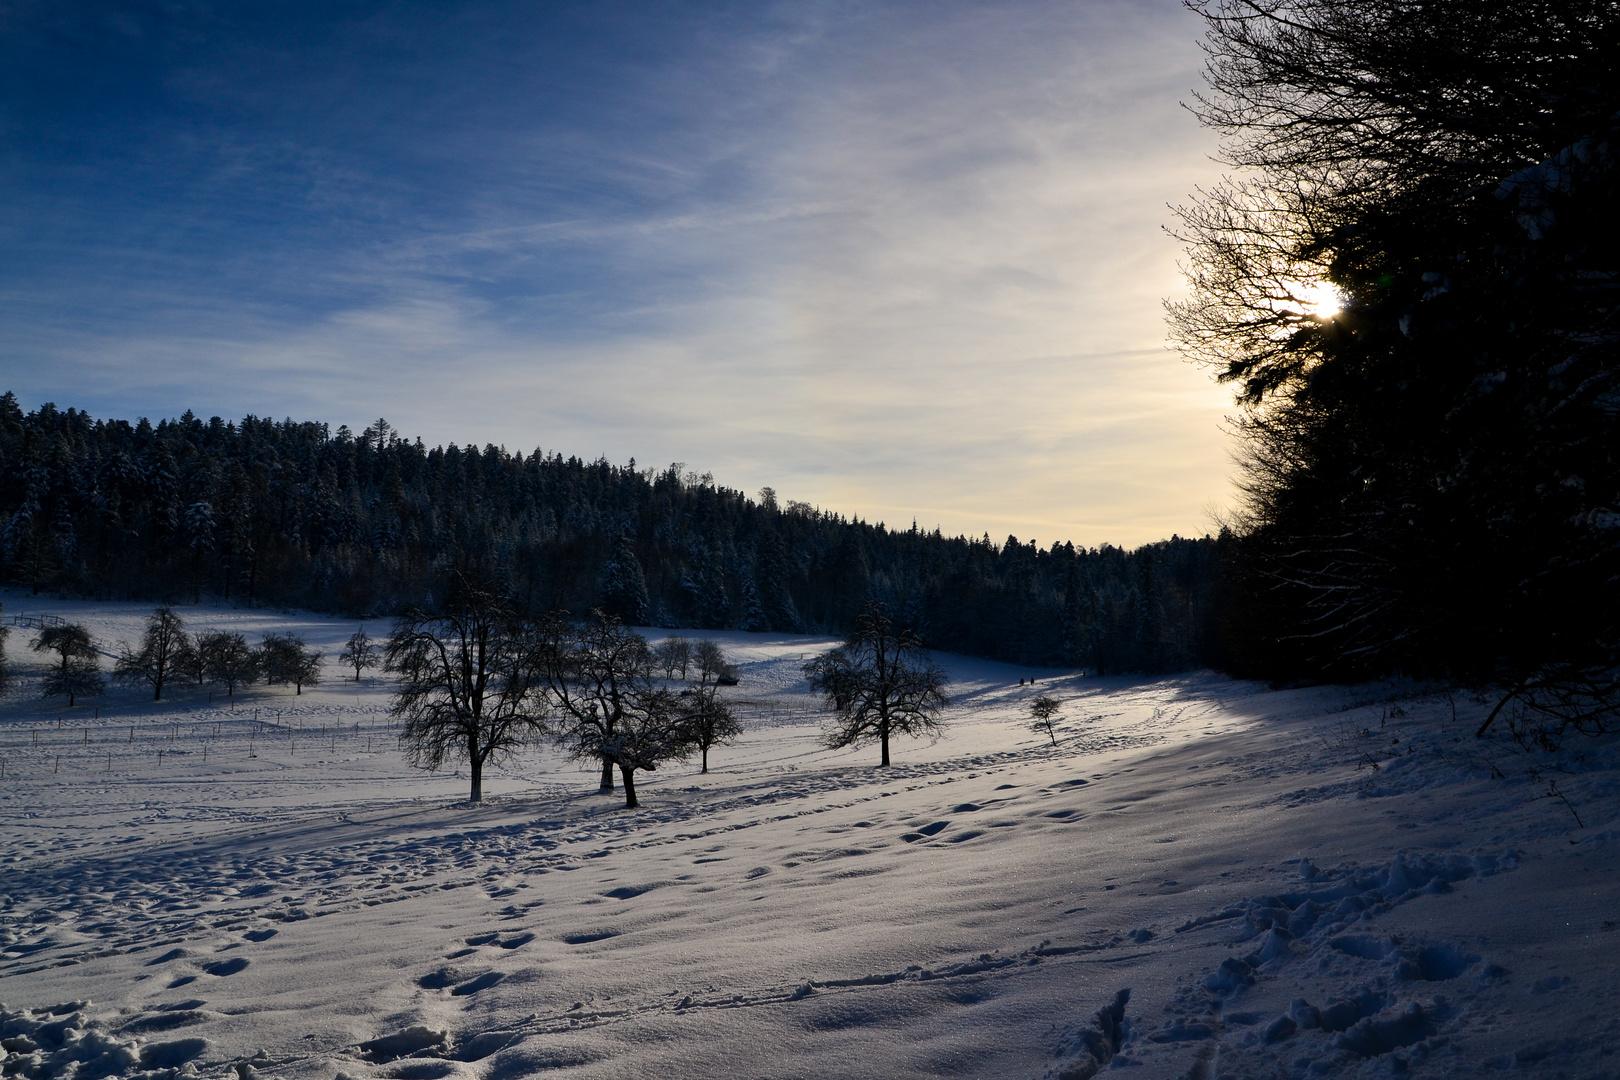 Stille vor dem Sonnenuntegang